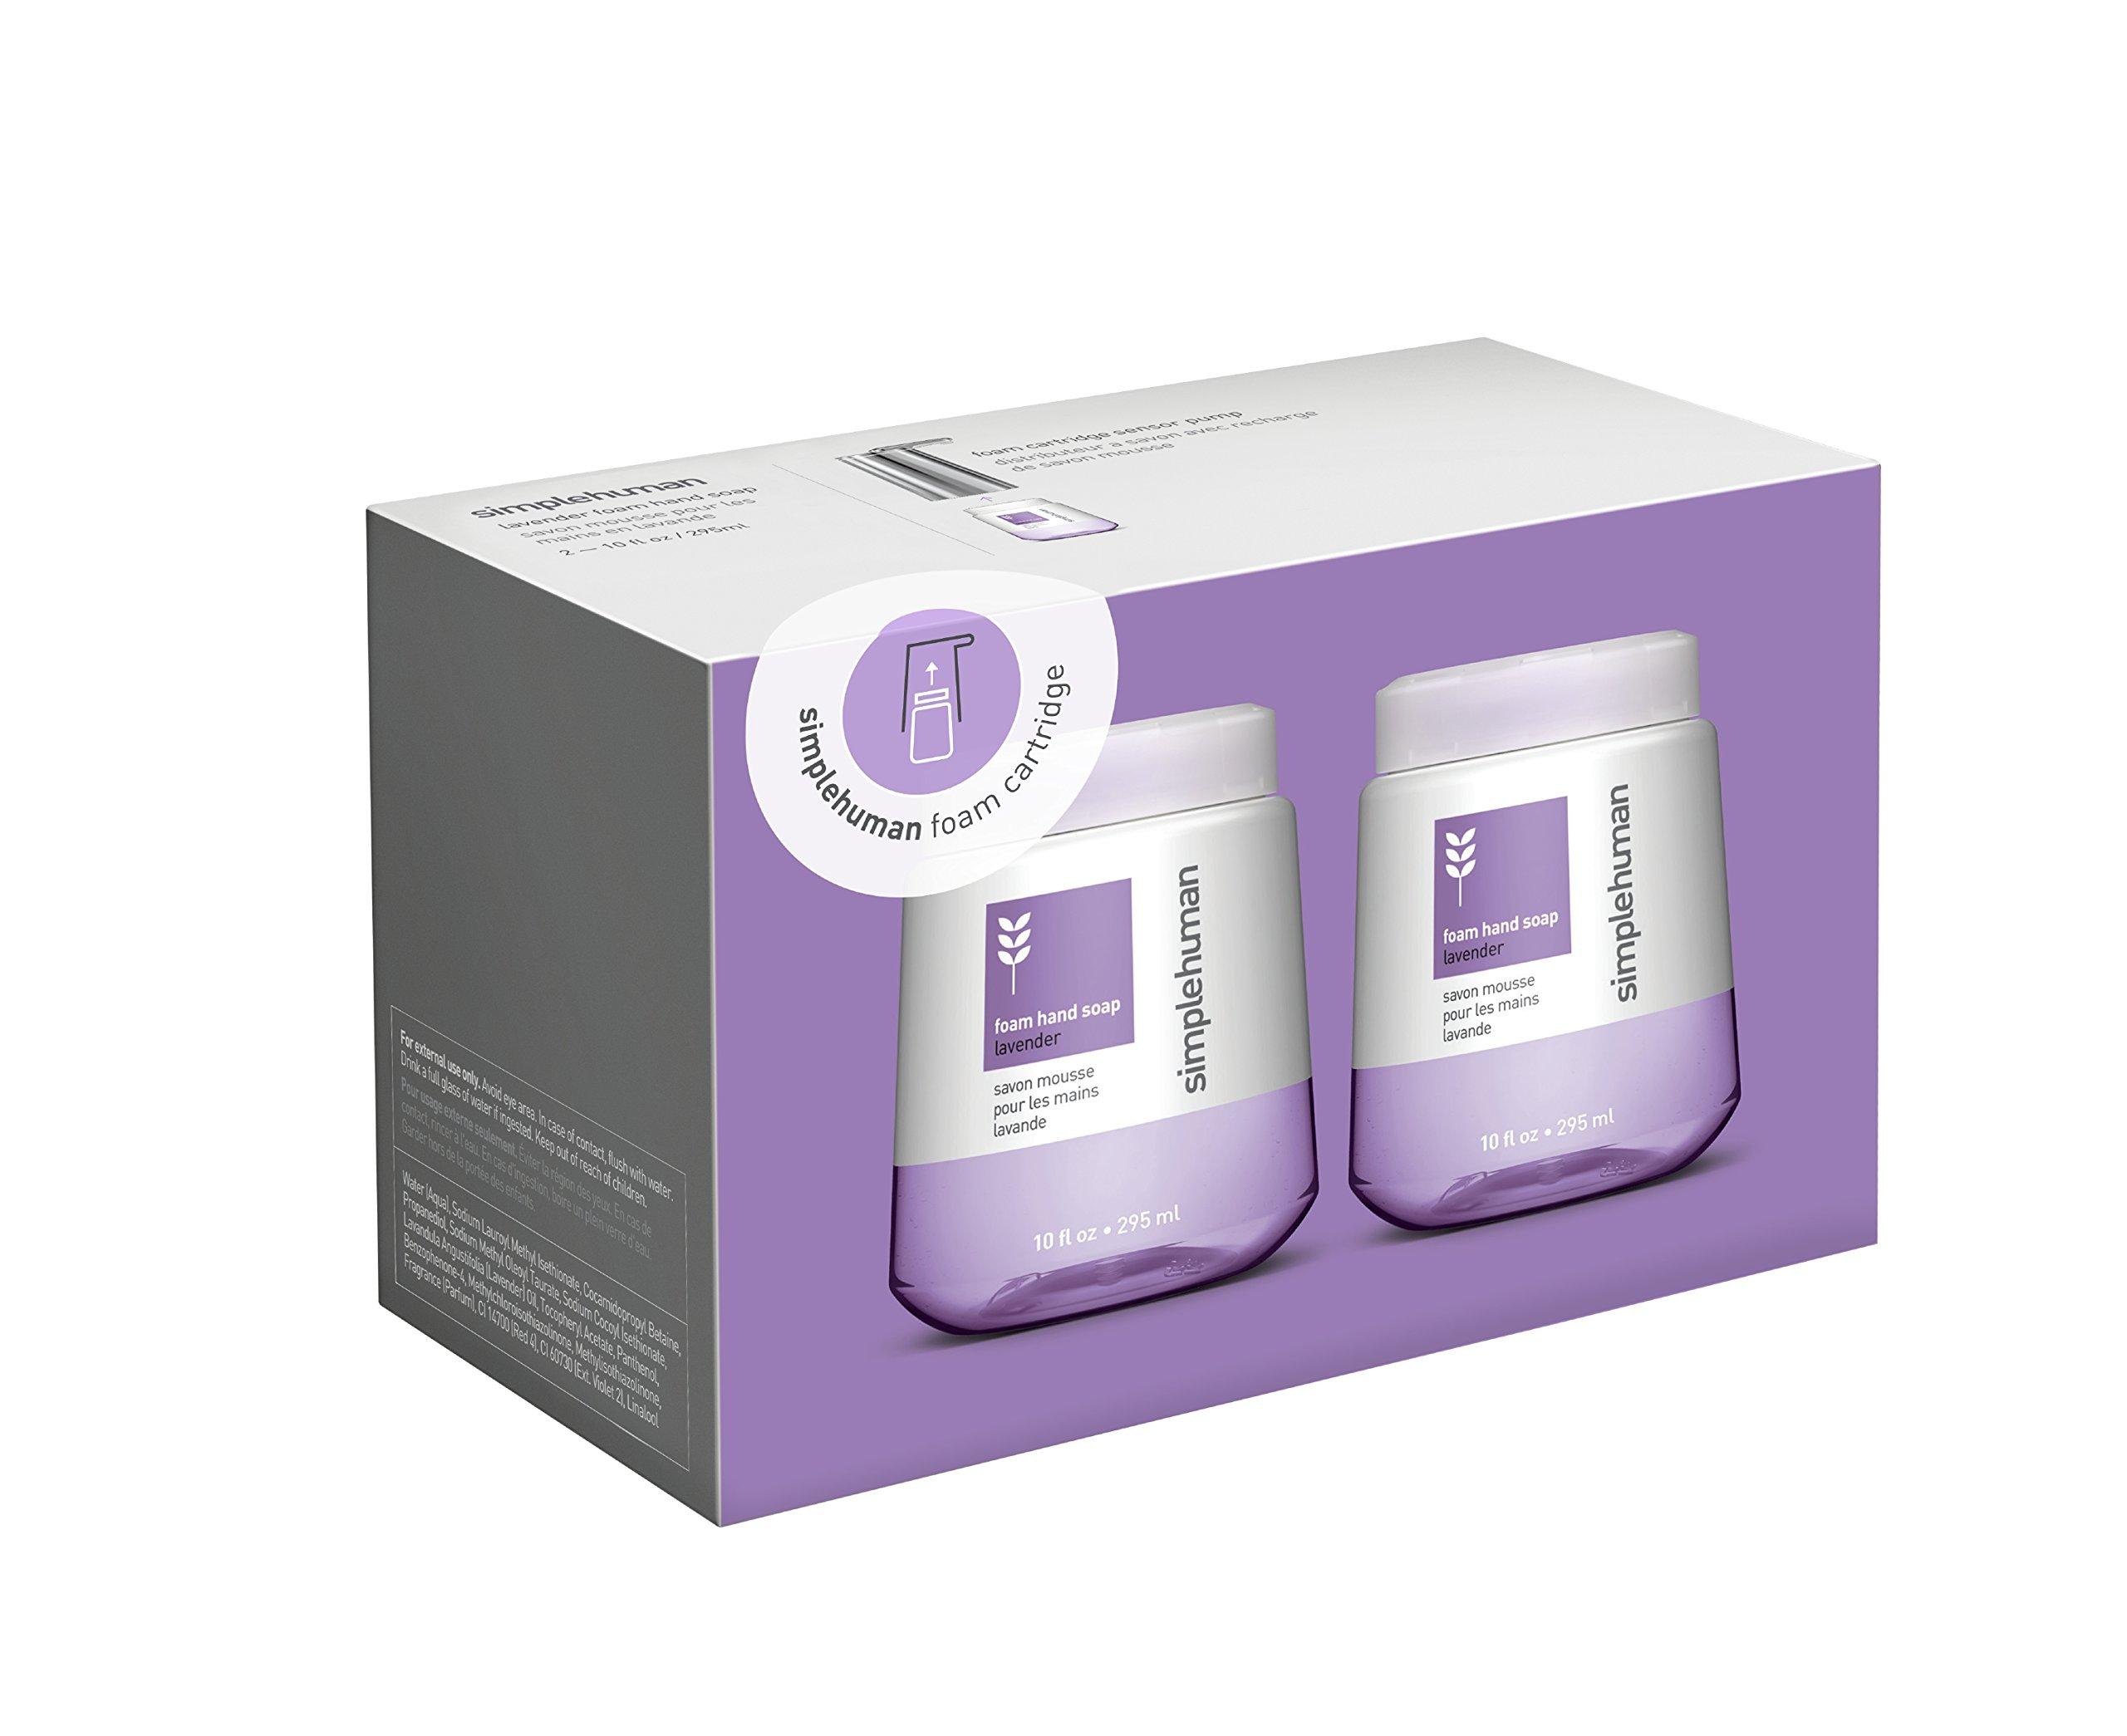 simplehuman Lavender Foam Hand Soap, 10 Fl. Oz. Foam Cartridges (2 pack)